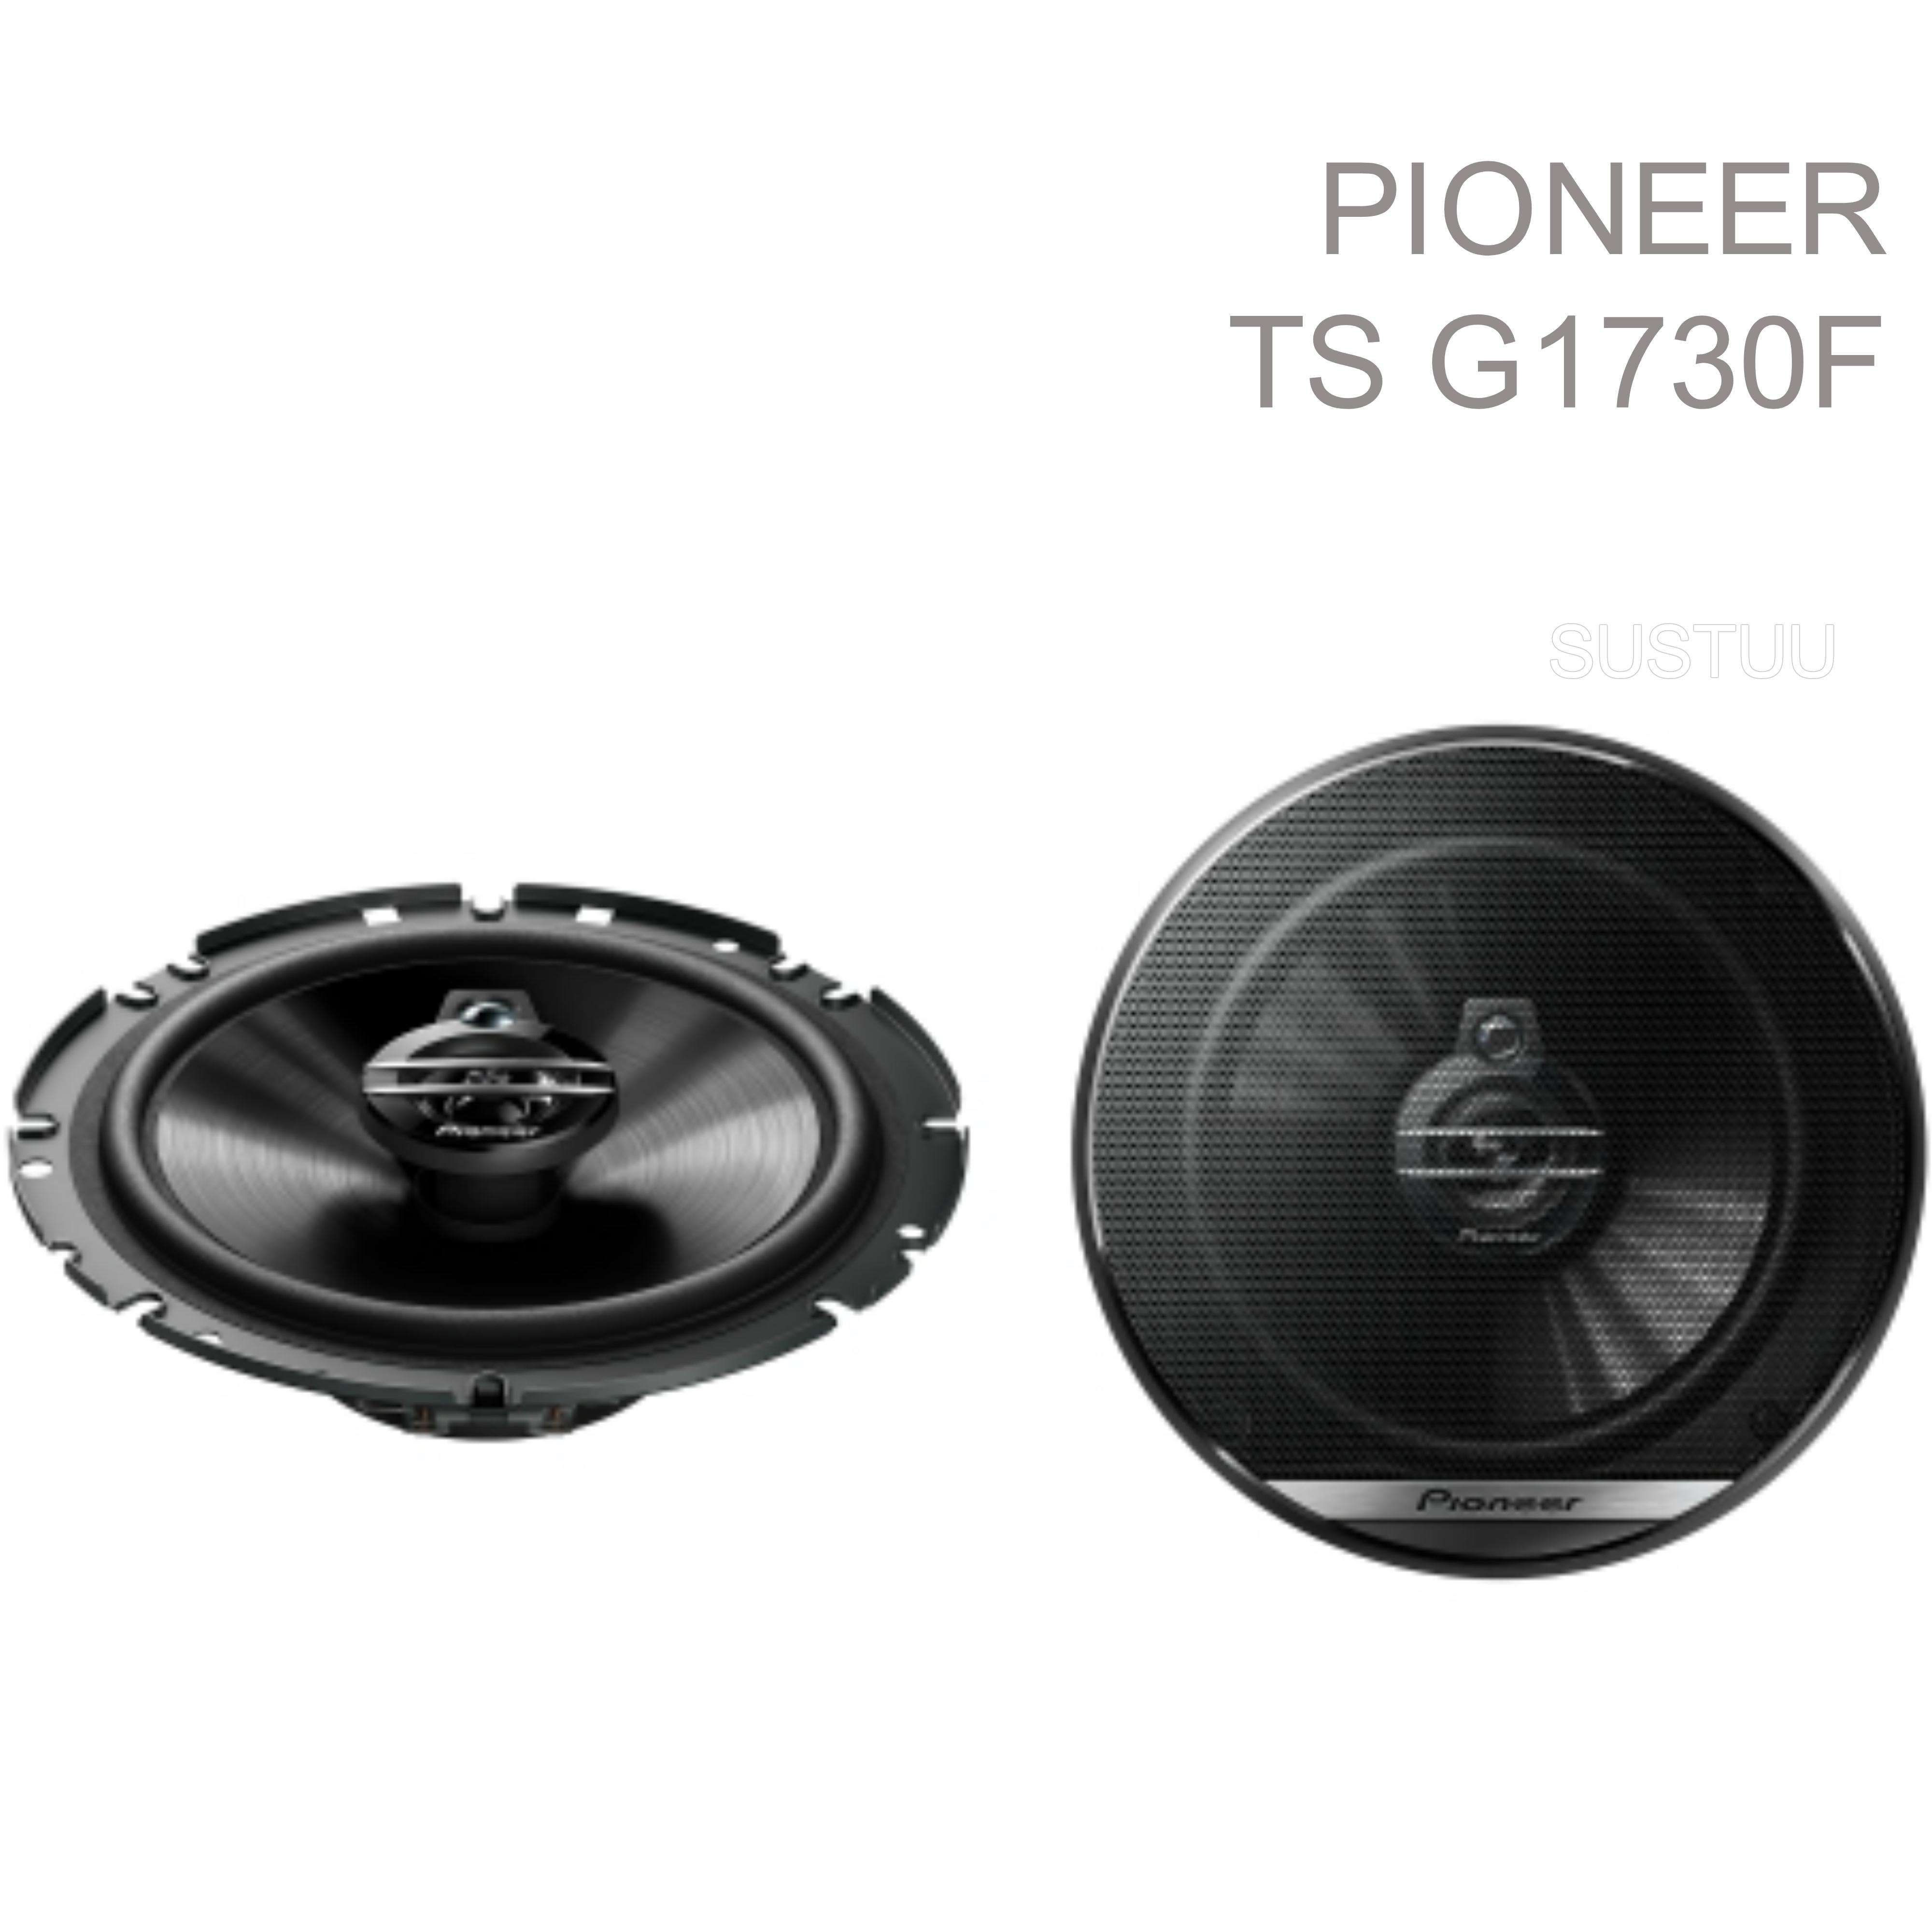 "Pioneer TS G1730F 6.5"" 300W 17Cm 3Way Coaxial Car Van Door Speakers 1Yr WARRANTY"